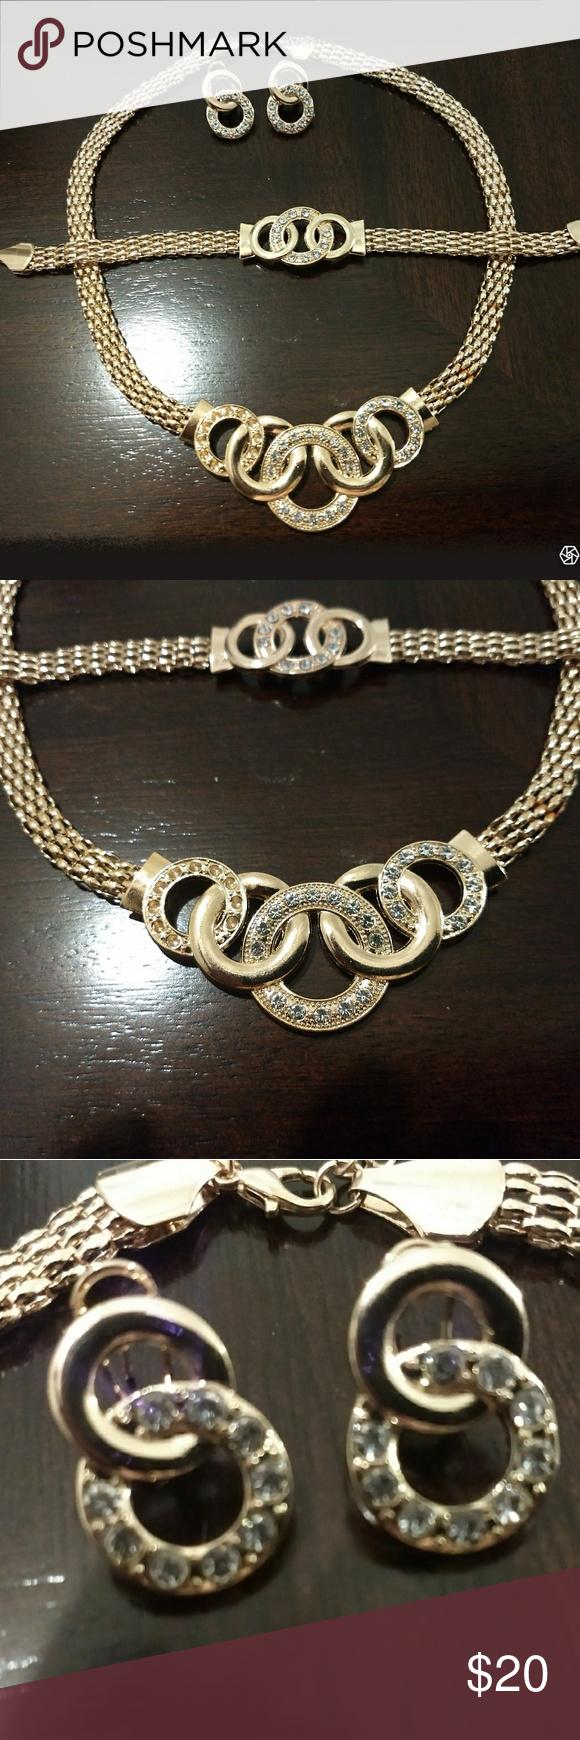 Elegant necklace bracelet u earrings set nwot elegant gold wheat